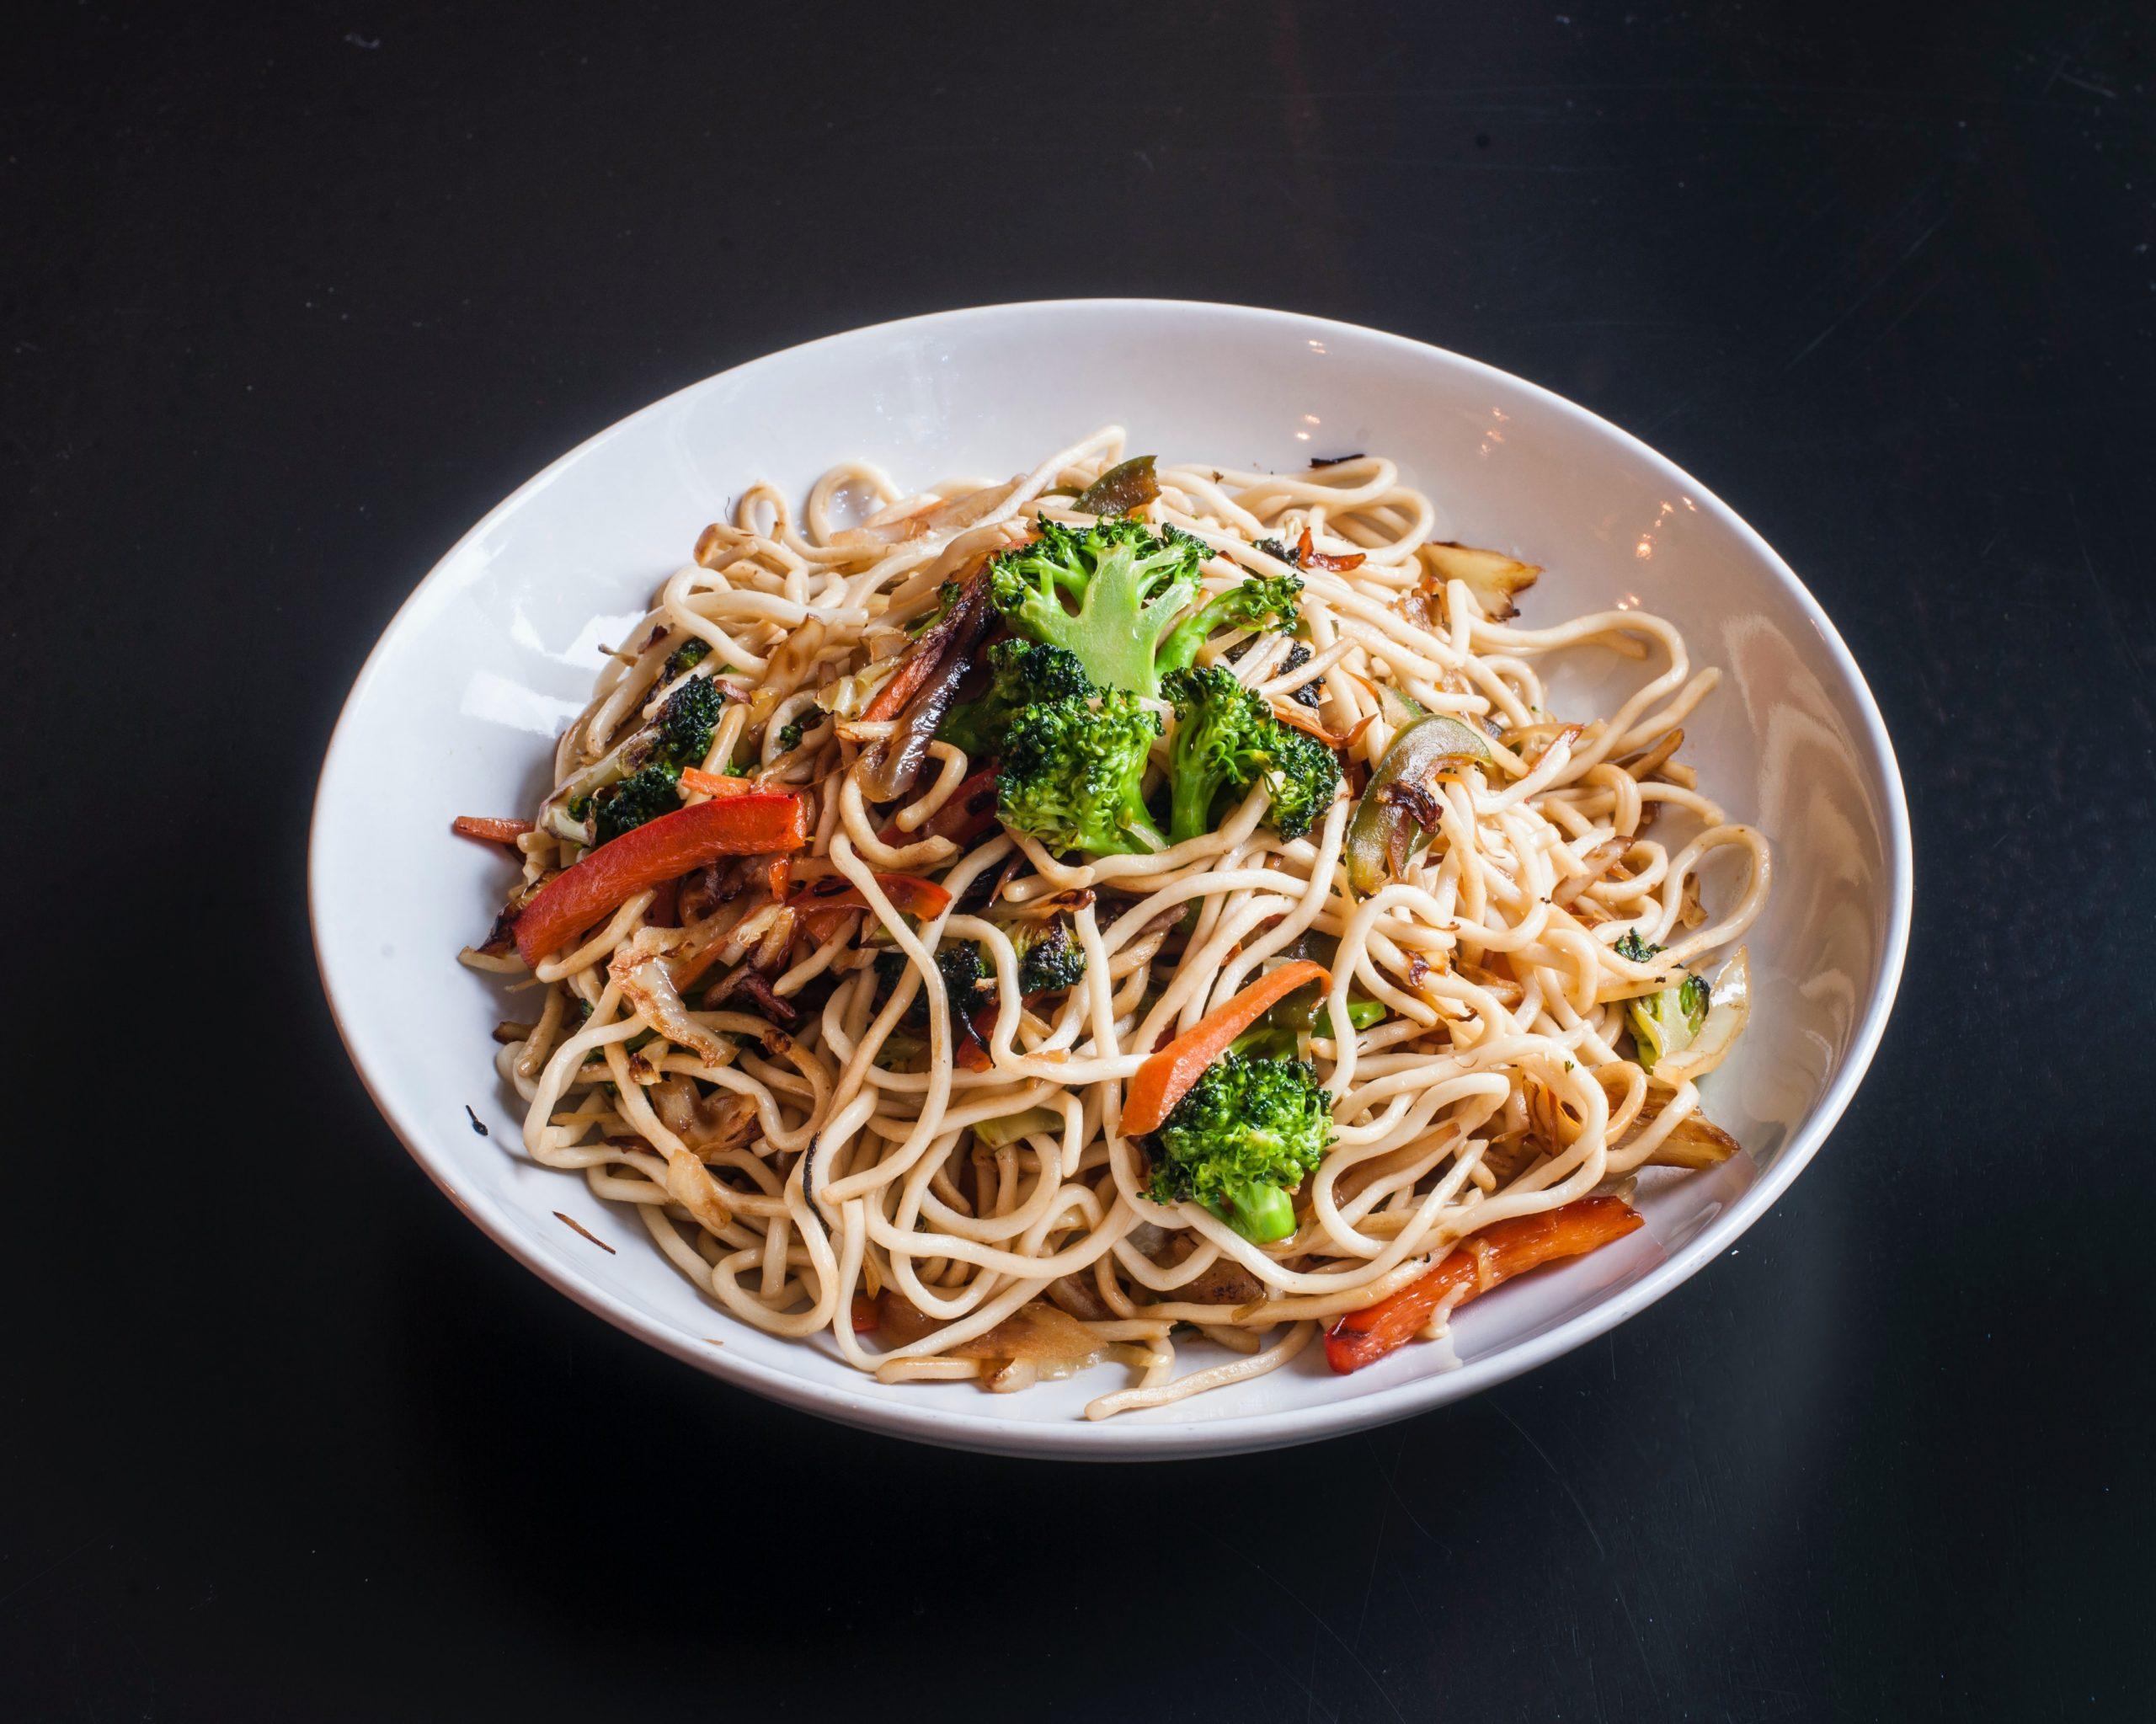 Indian Chinese Recipe- Hakka Noodles & Stir Fried Tofu